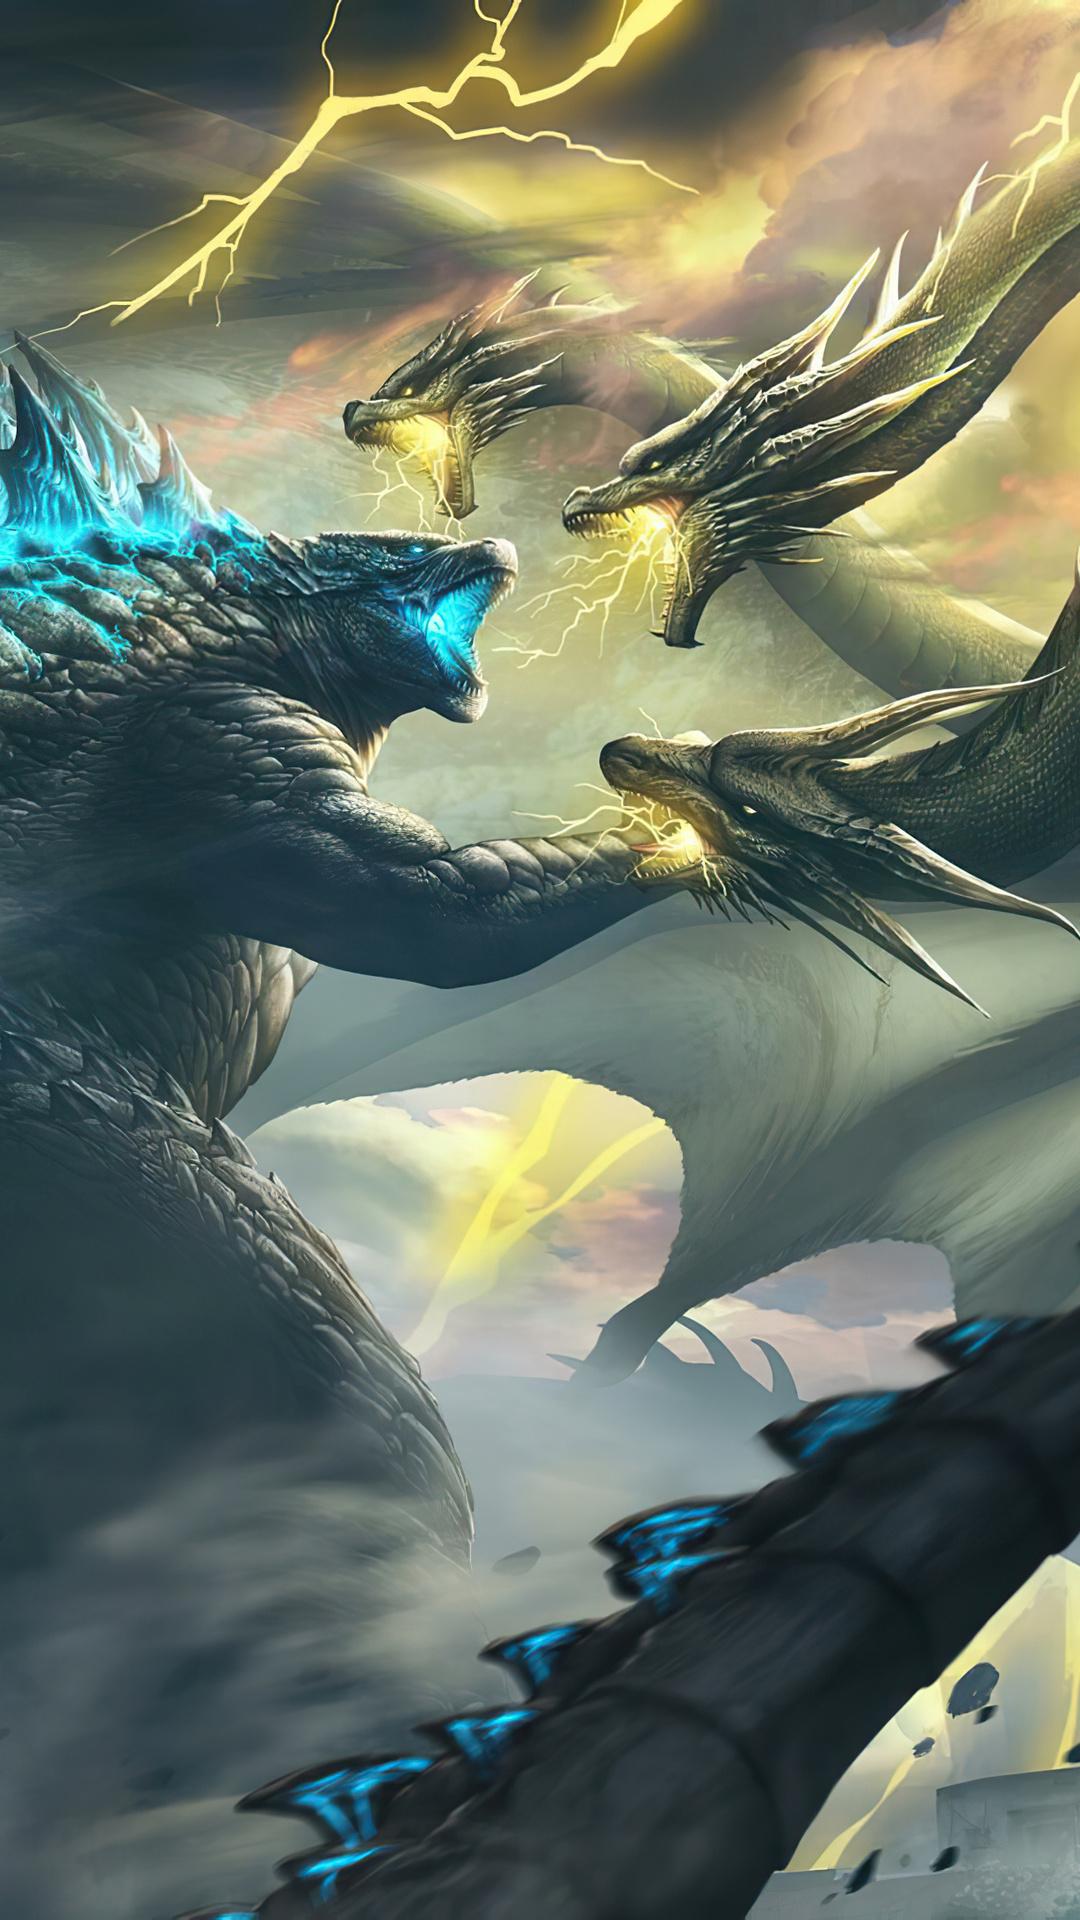 1080x1920 Ghidorah Godzilla King Of The Monsters 4k Iphone ...